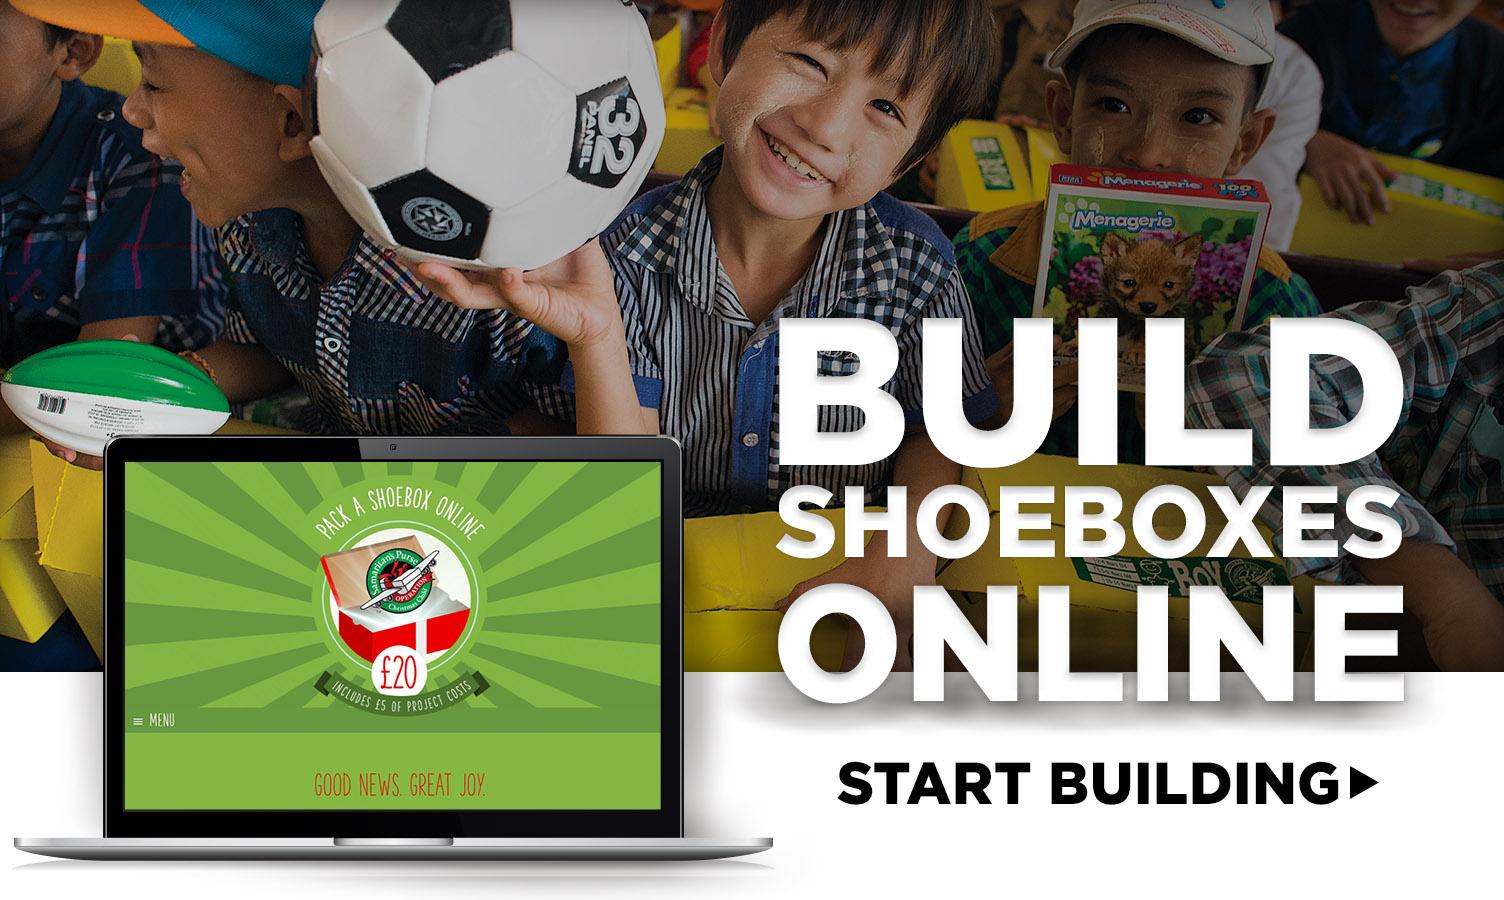 build shoeboxes online - start building